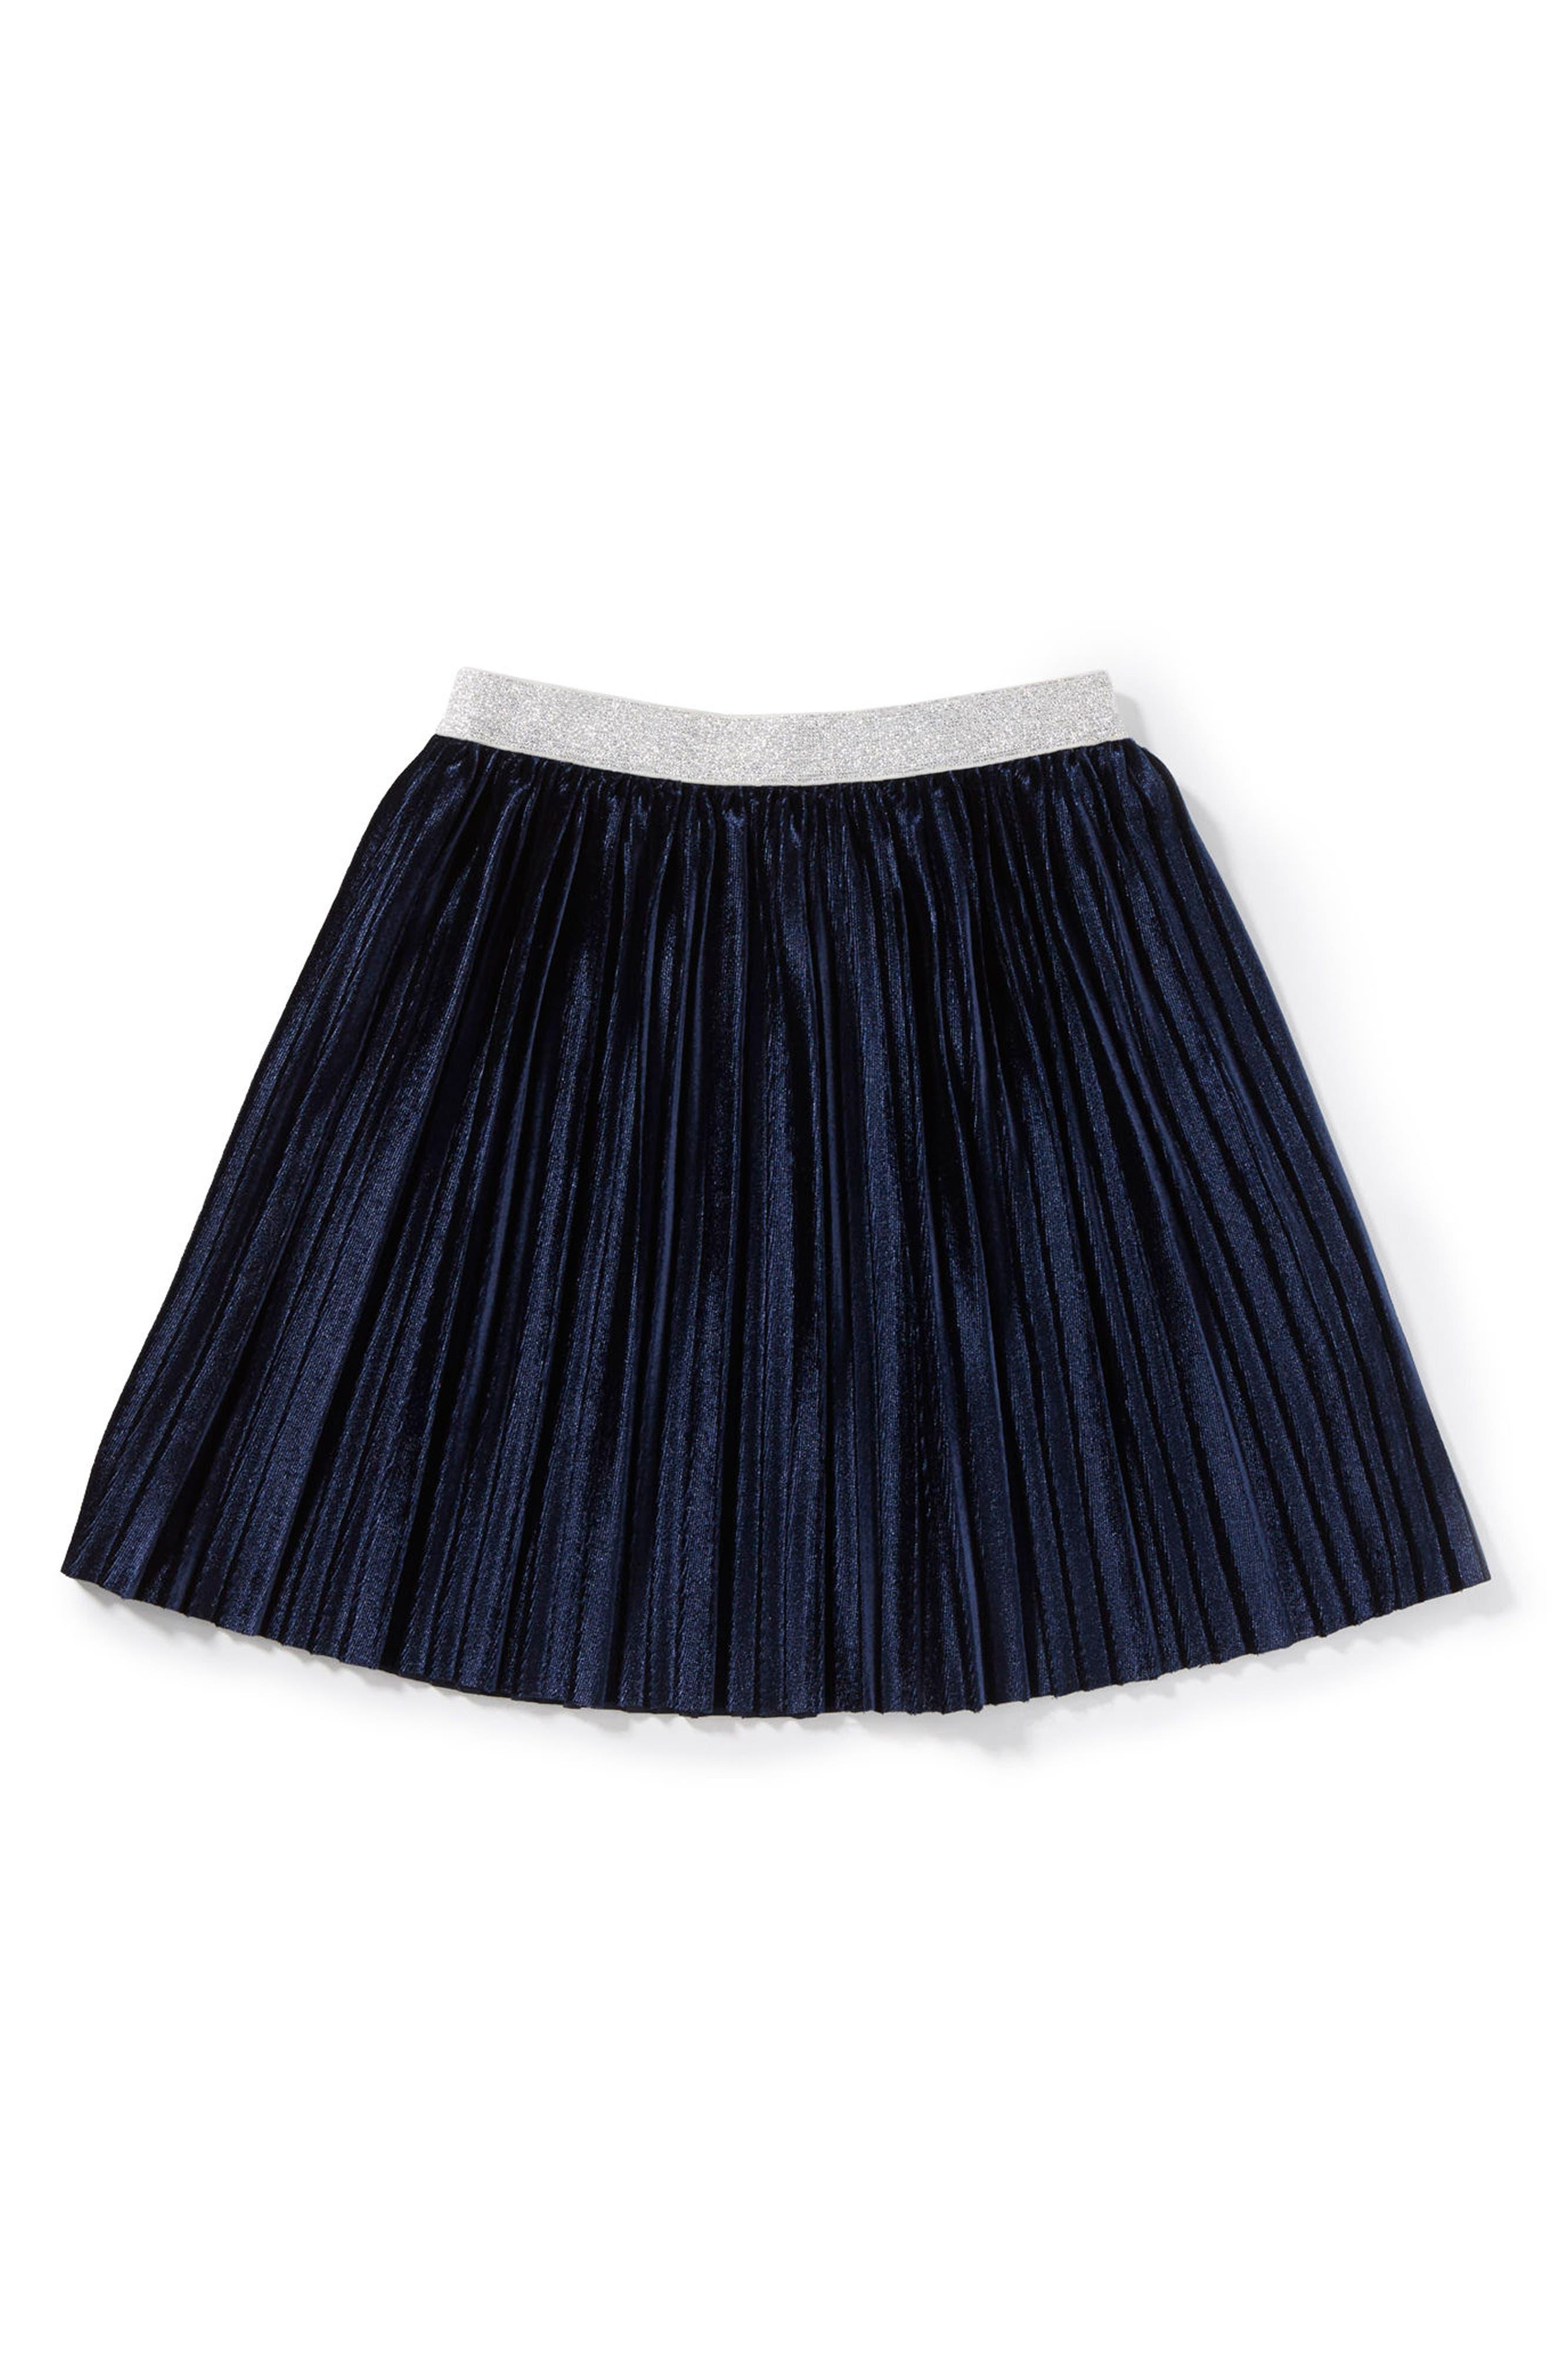 Main Image - Peek Marissa Pleated Skirt (Toddler Girls, Little Girls & Big Girls)